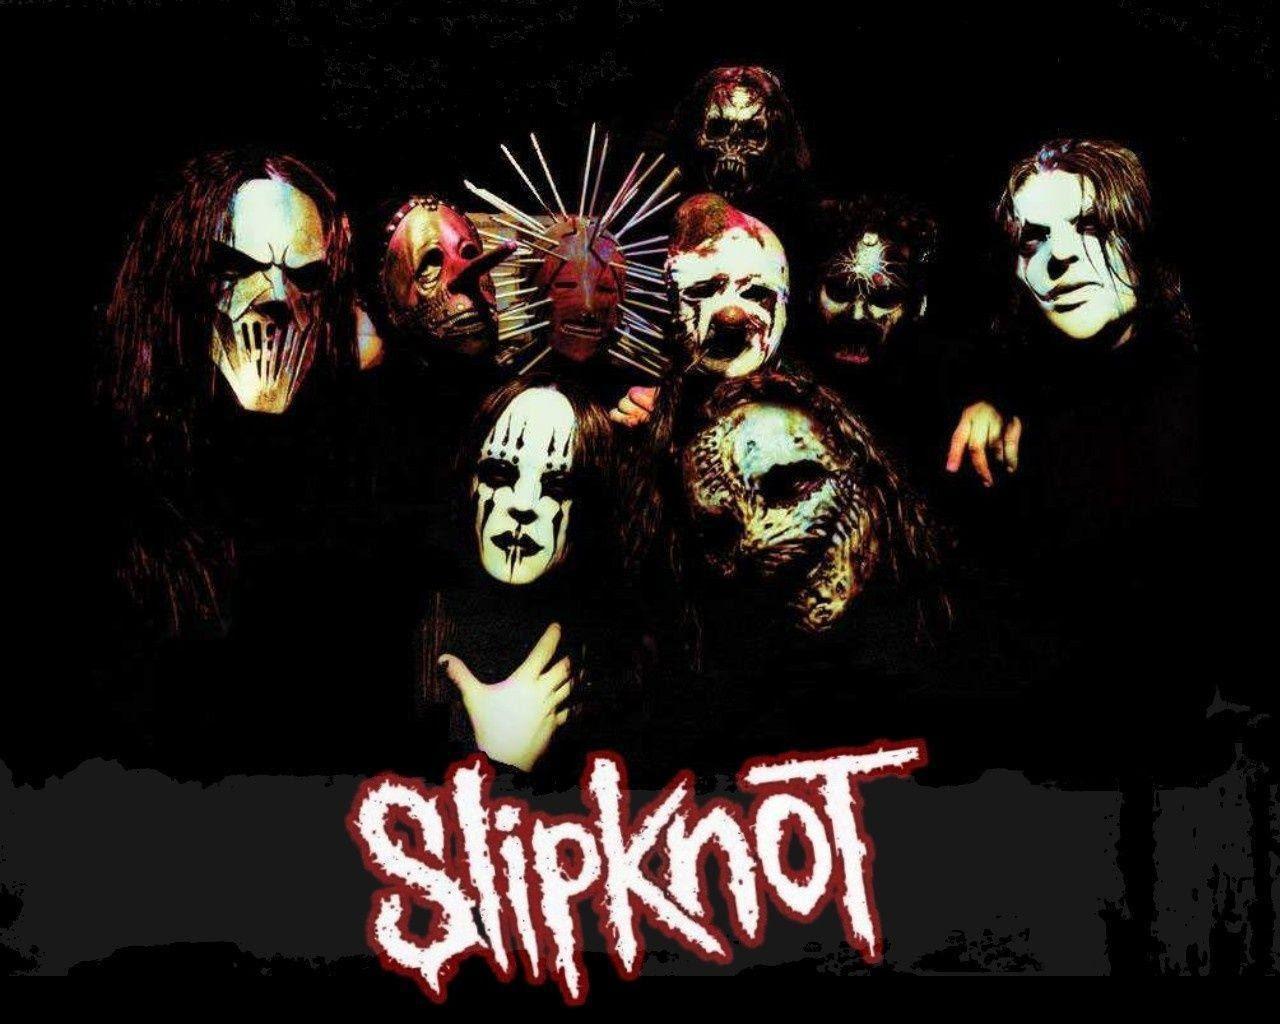 Slipknot Wallpapers - Wallpaper Cave